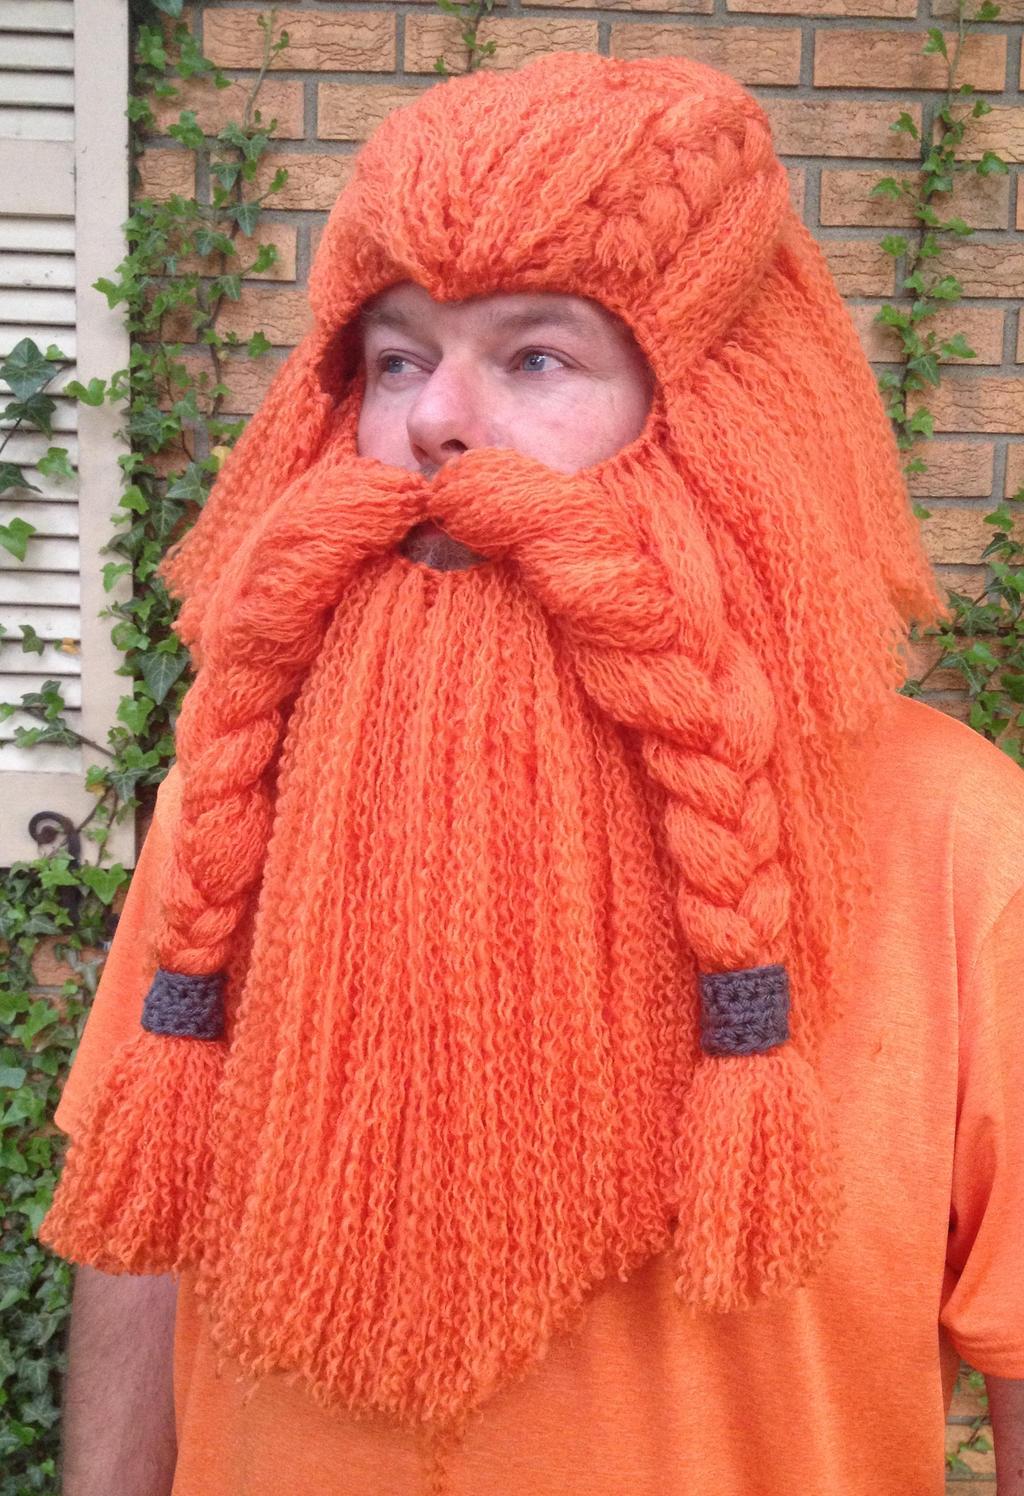 Full Dwarf hair and beard by Drgibbs on DeviantArt 9c5f85b0120